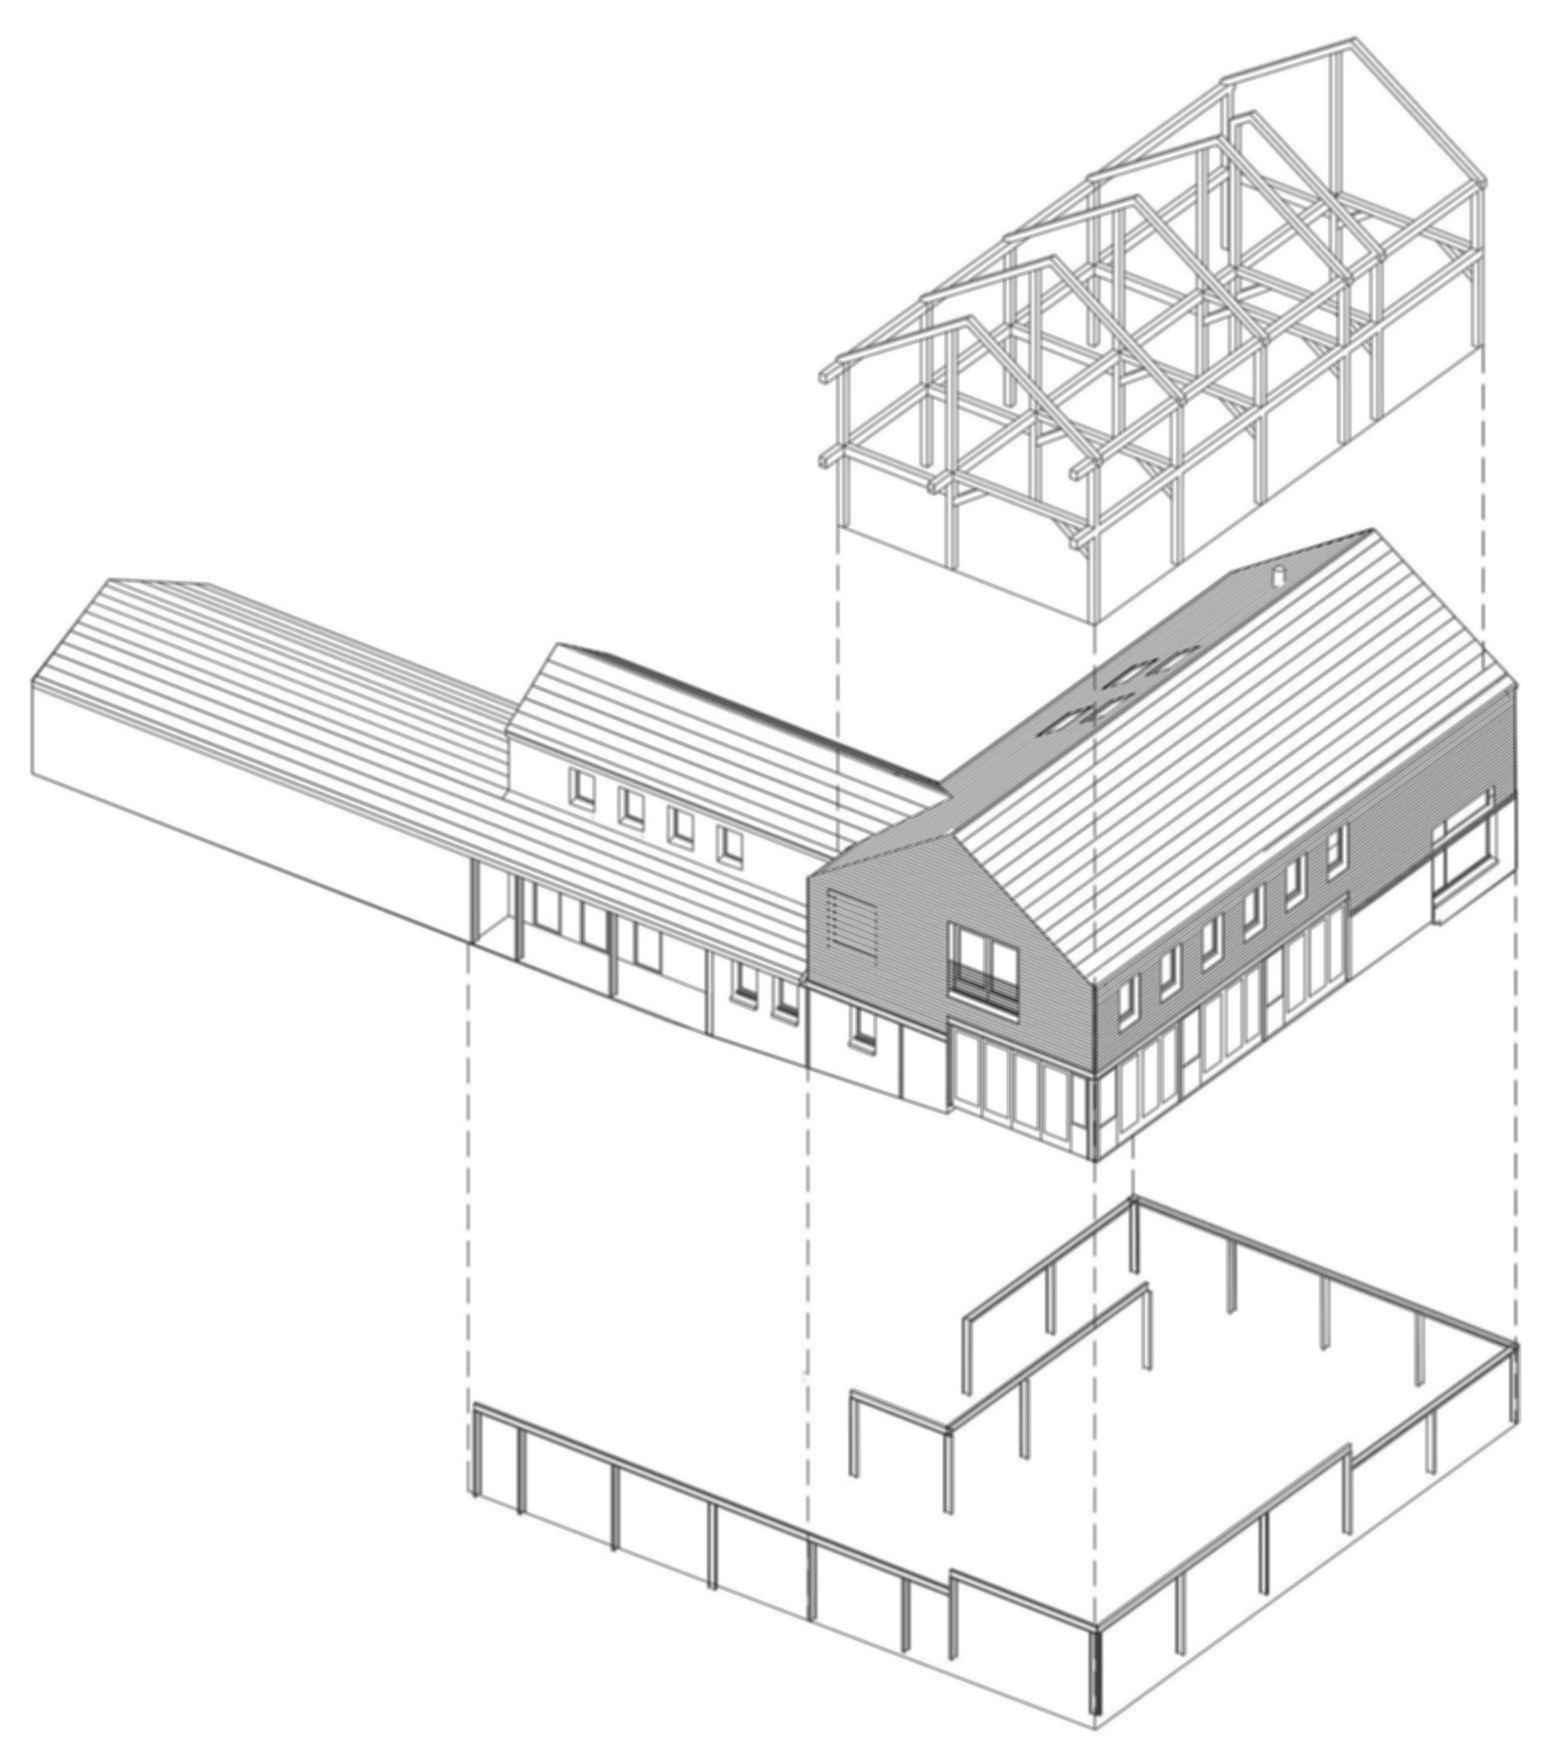 Timber Frame House - Concept Design